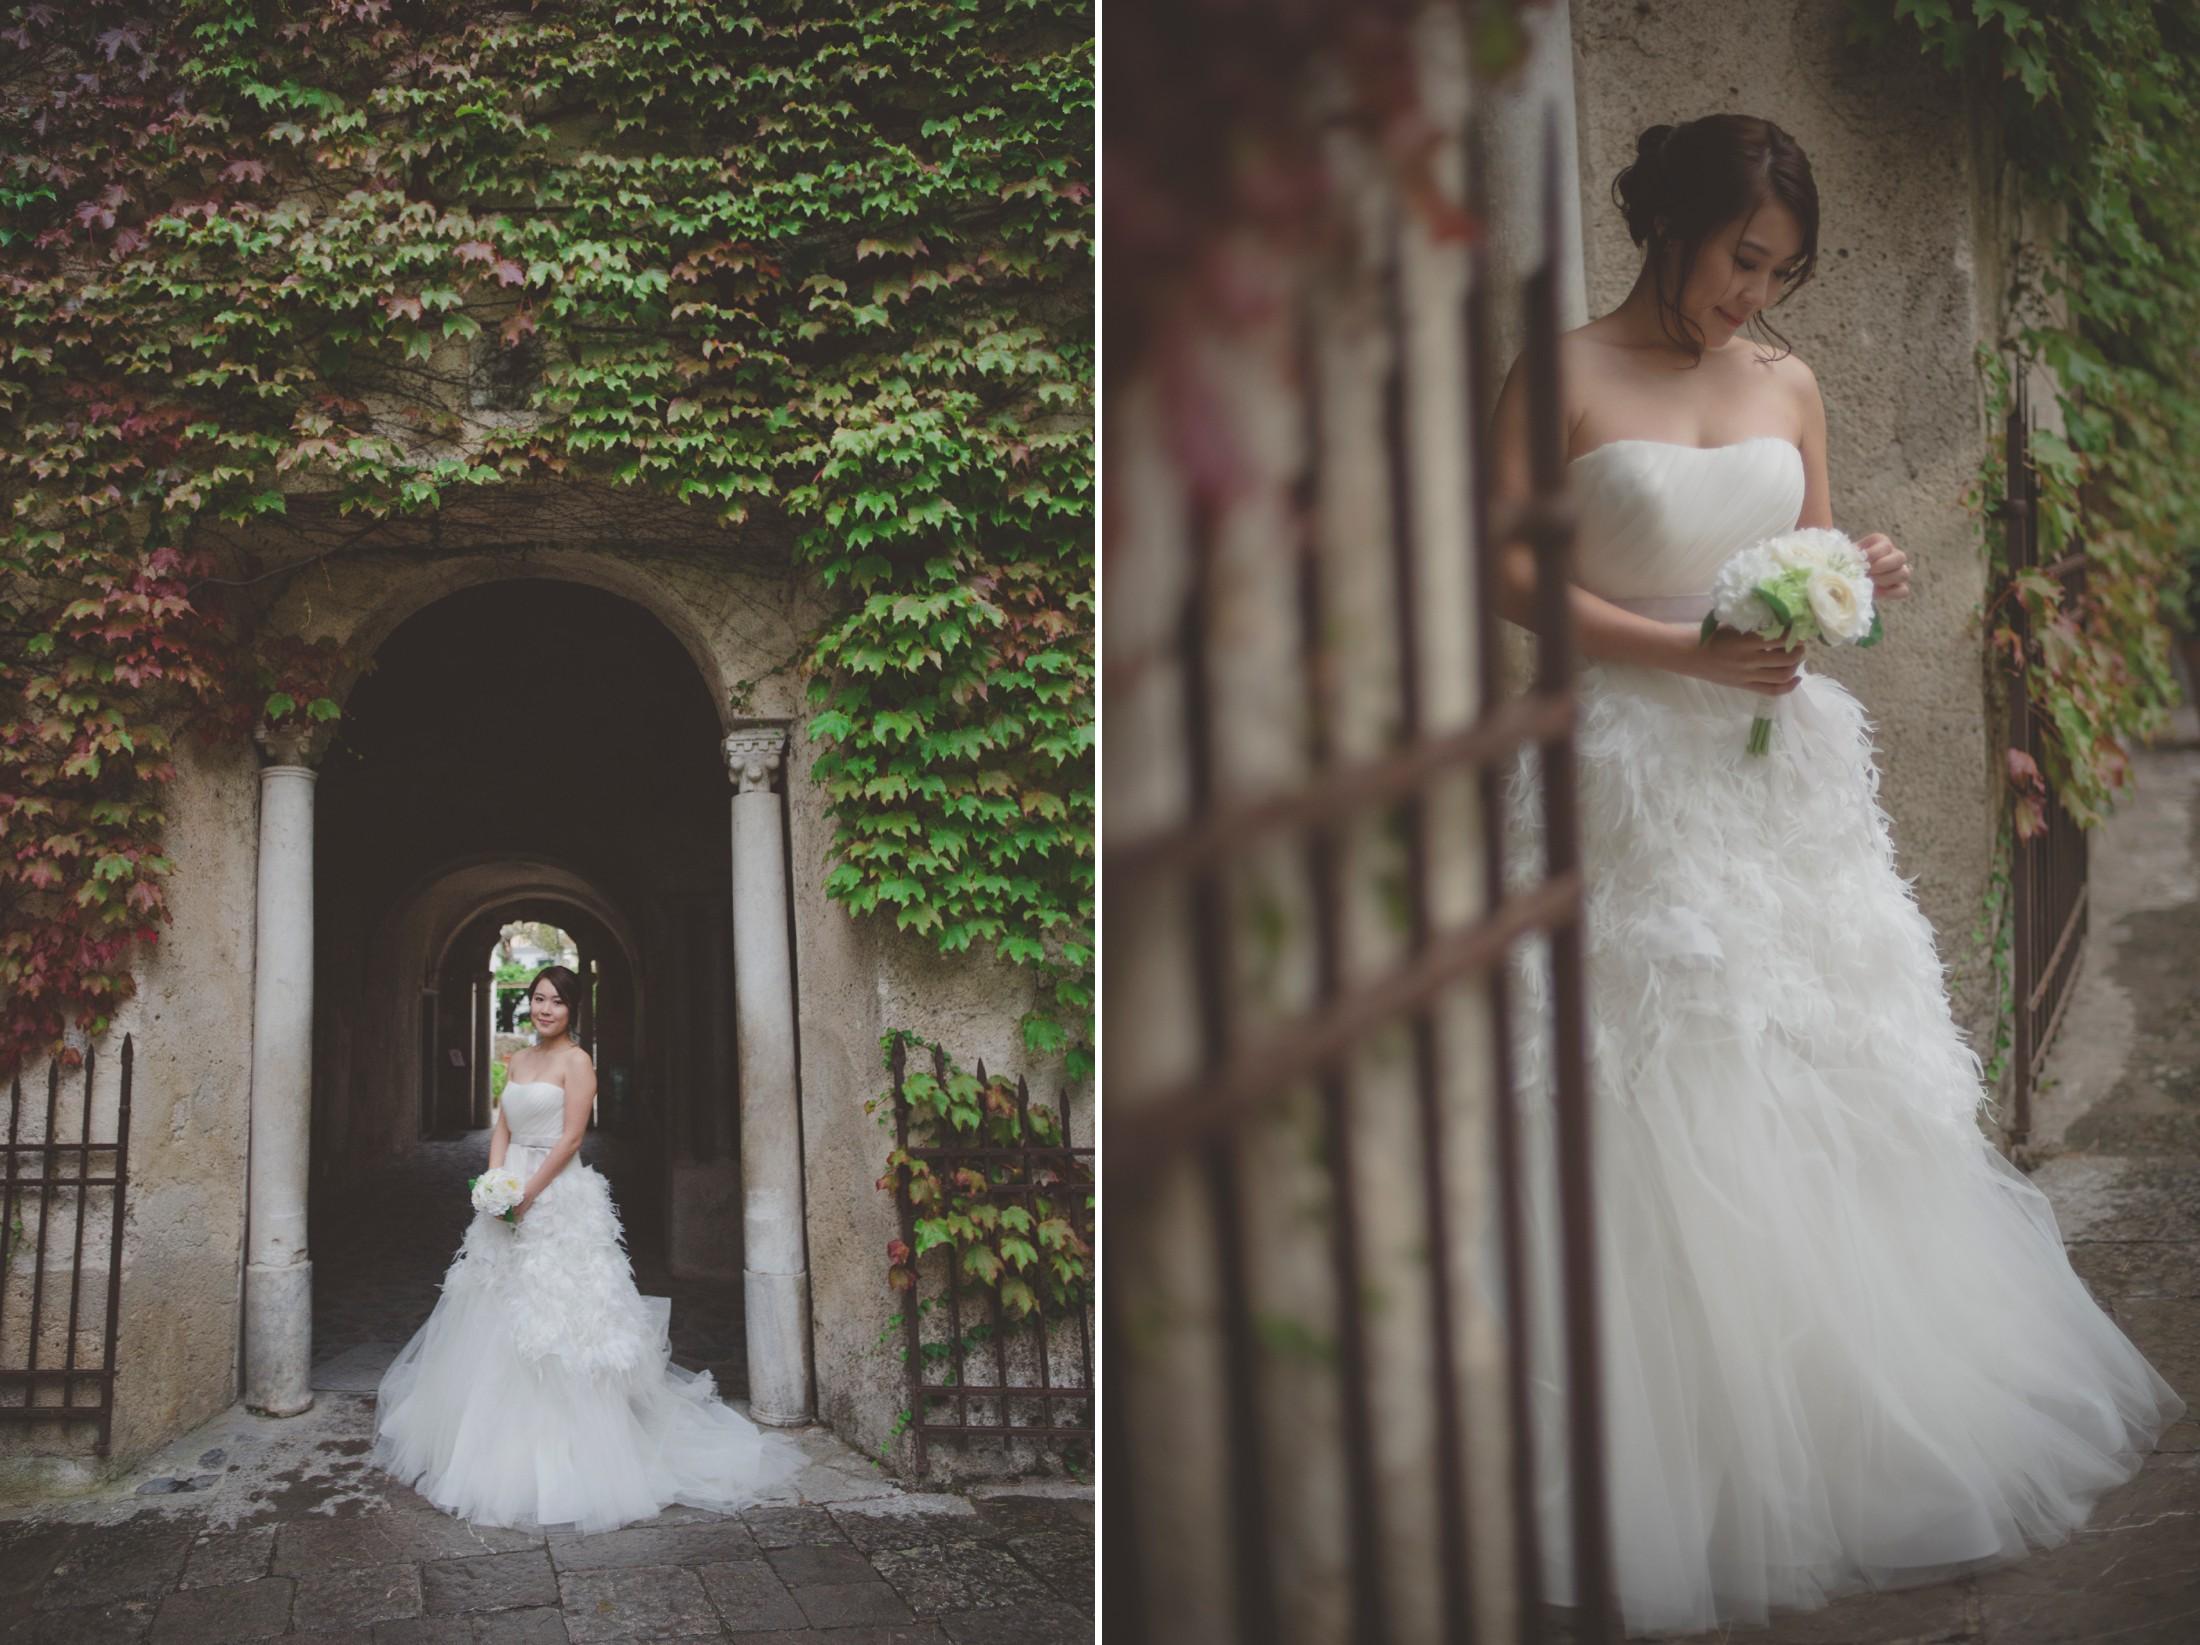 wedding on the amalfi coast bride's portraits at villa Rufolo in ravello